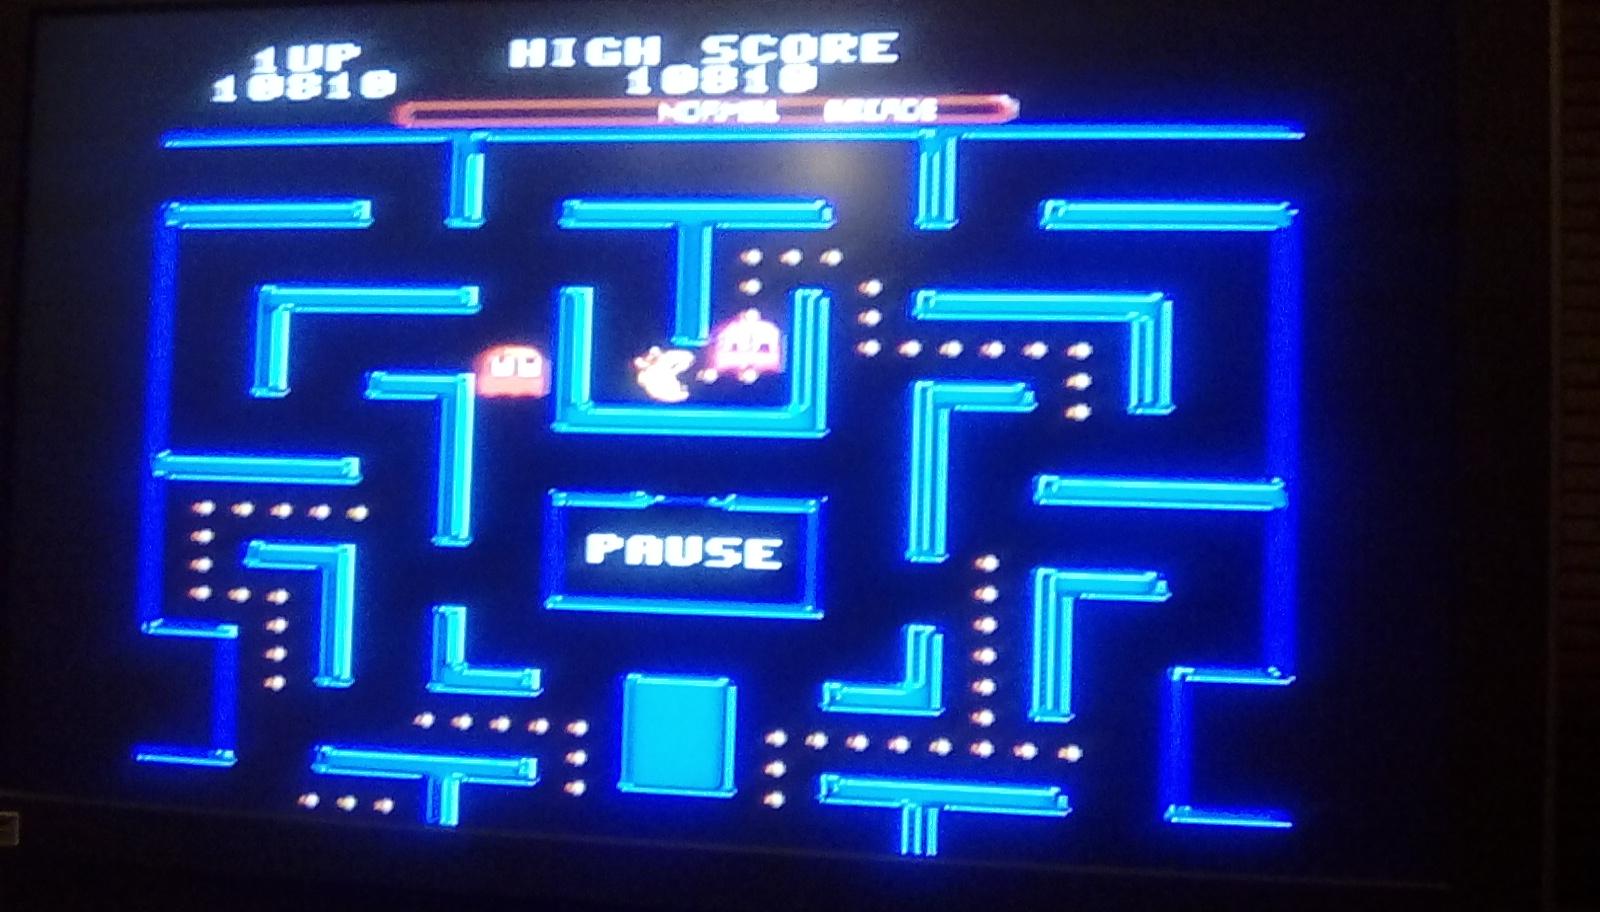 Ms. Pac-Man [Medium] 10,810 points